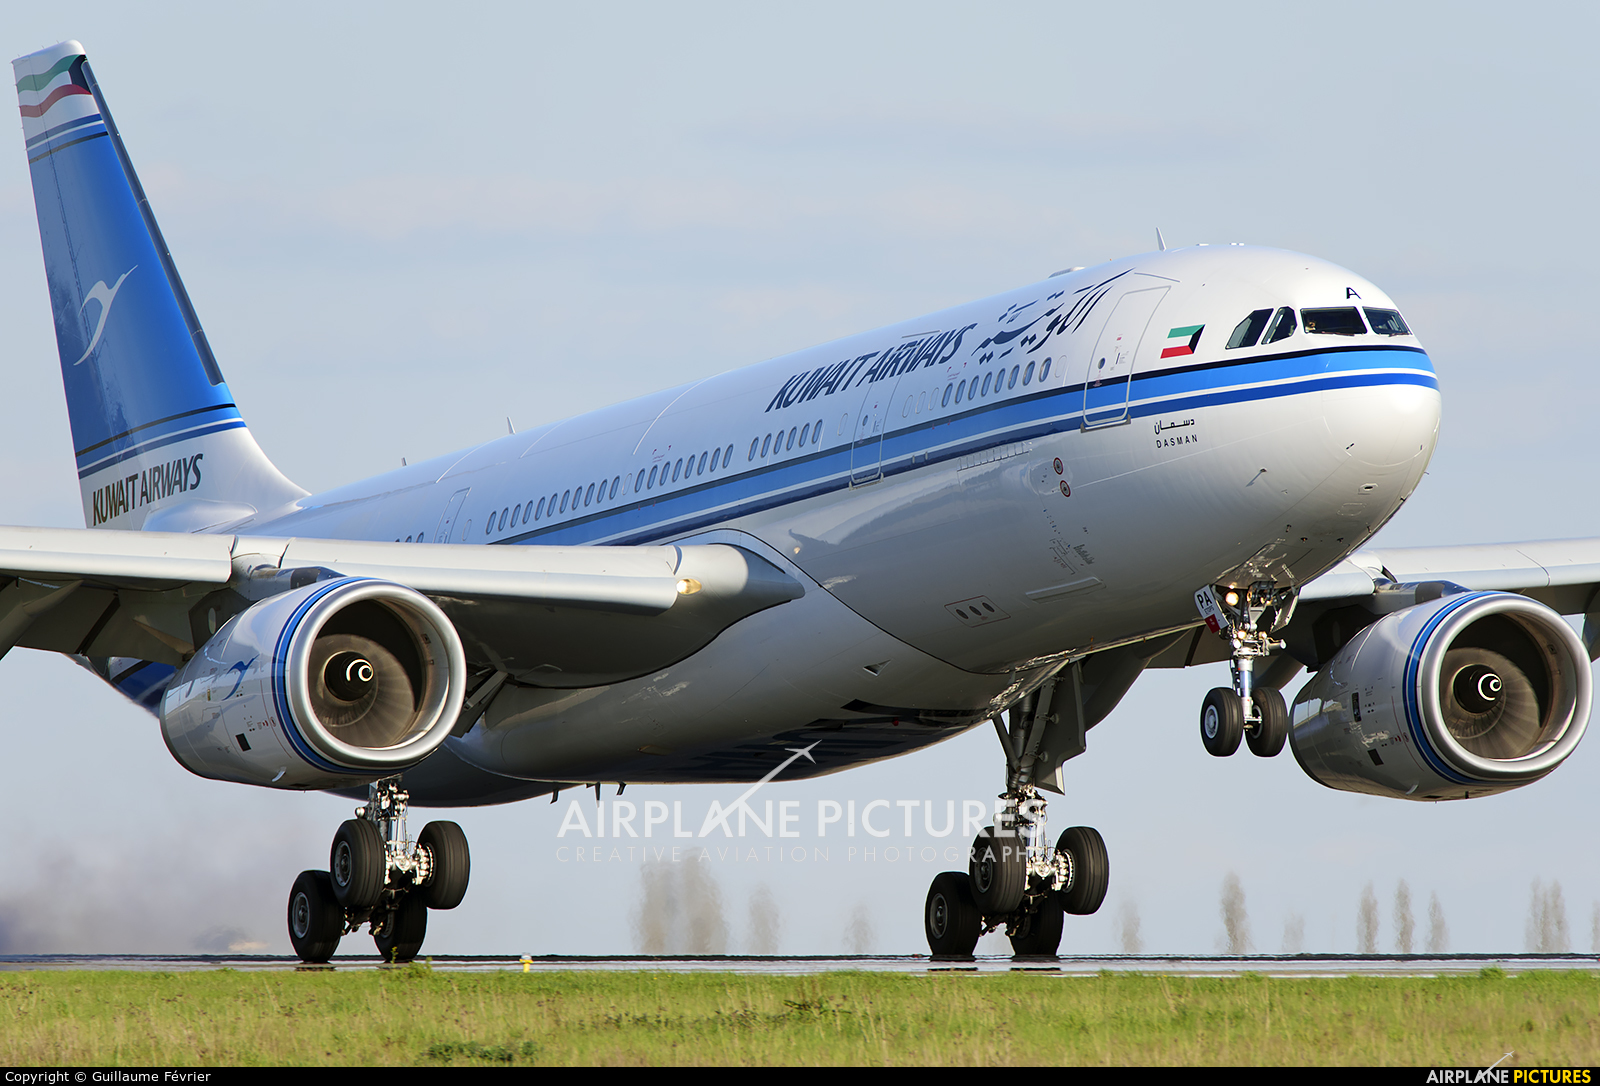 Kuwait Airways 9K-APB aircraft at Paris - Charles de Gaulle